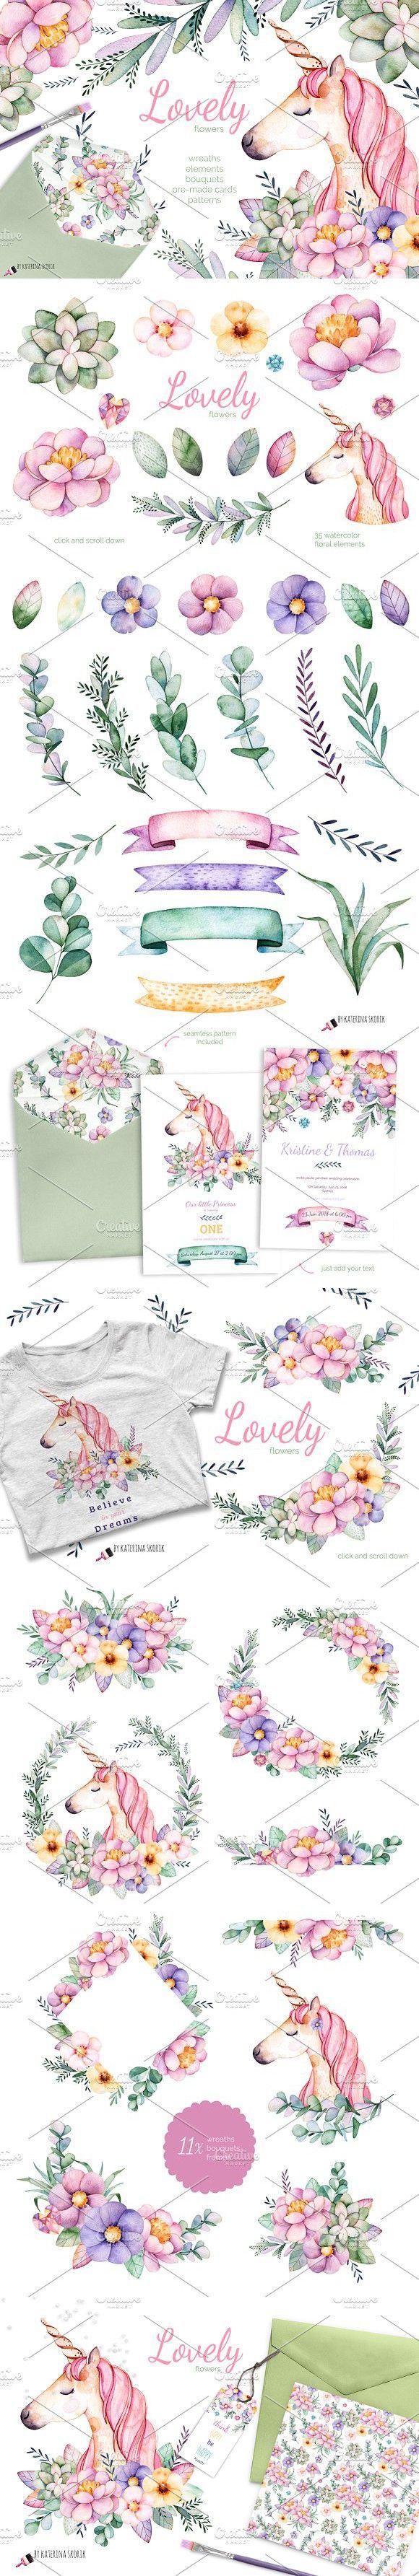 Lovely Flowers&Unicorn. Wedding Card Templates